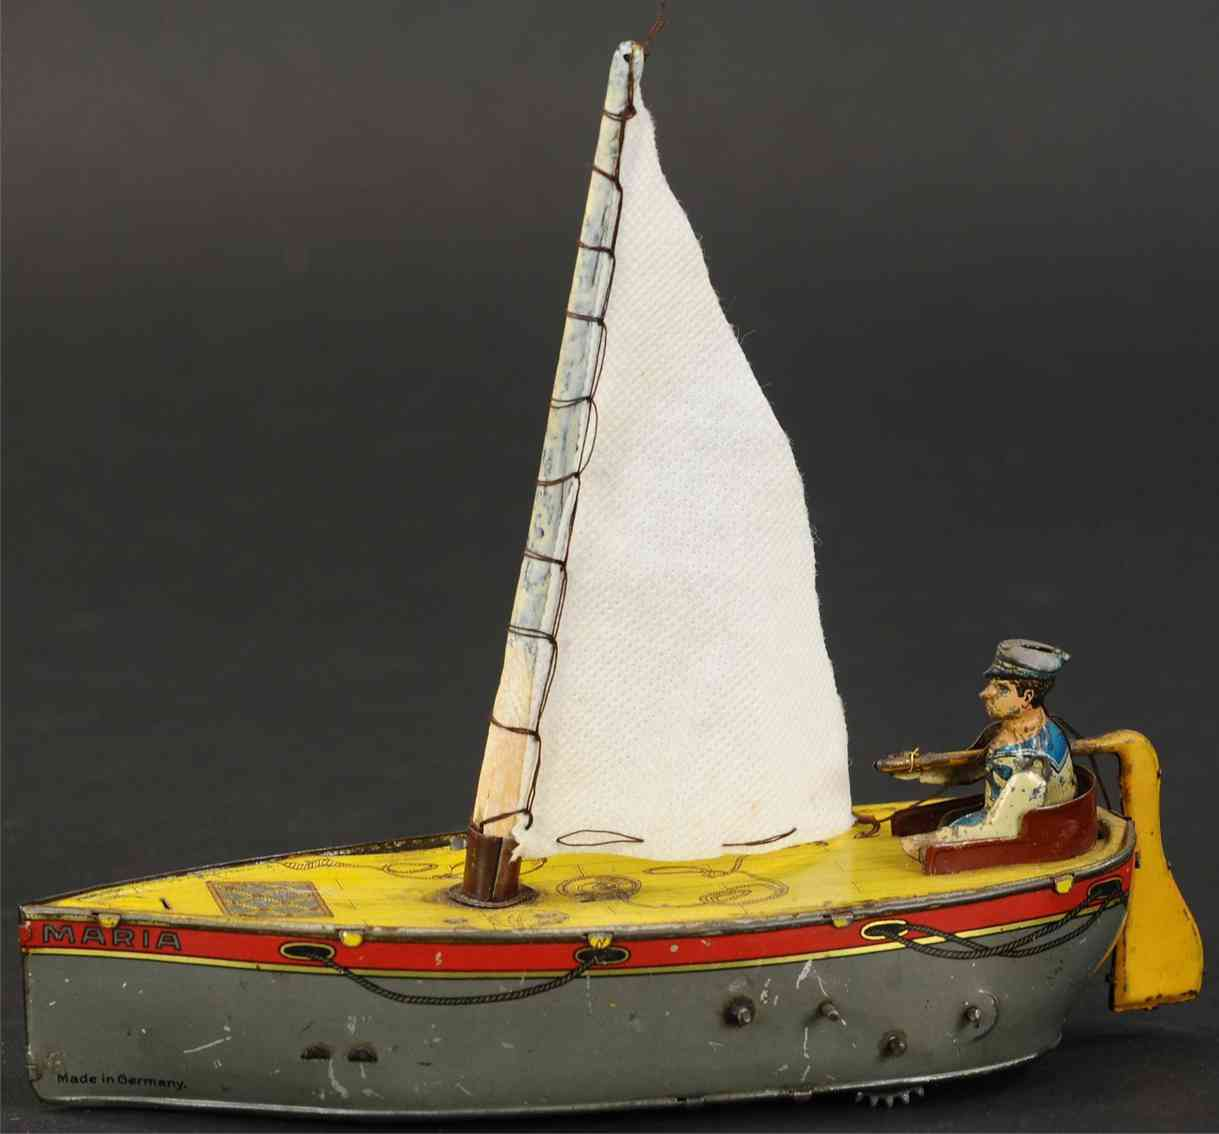 eberl hans blech spielzeug ebo hipp-hipp segelboot maria mit uhrwerk